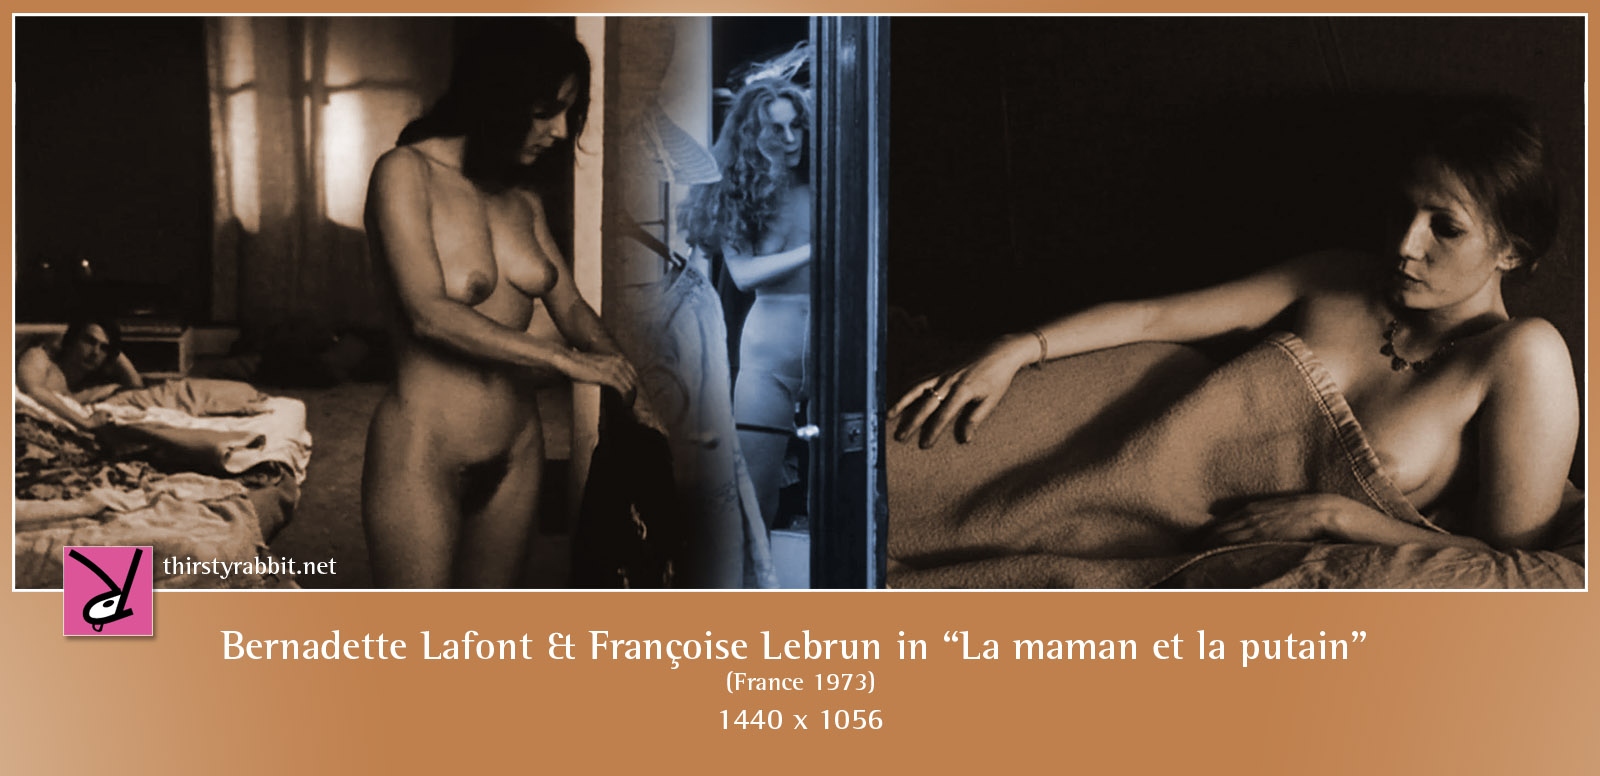 Nude bernadette lafont Vintage nude